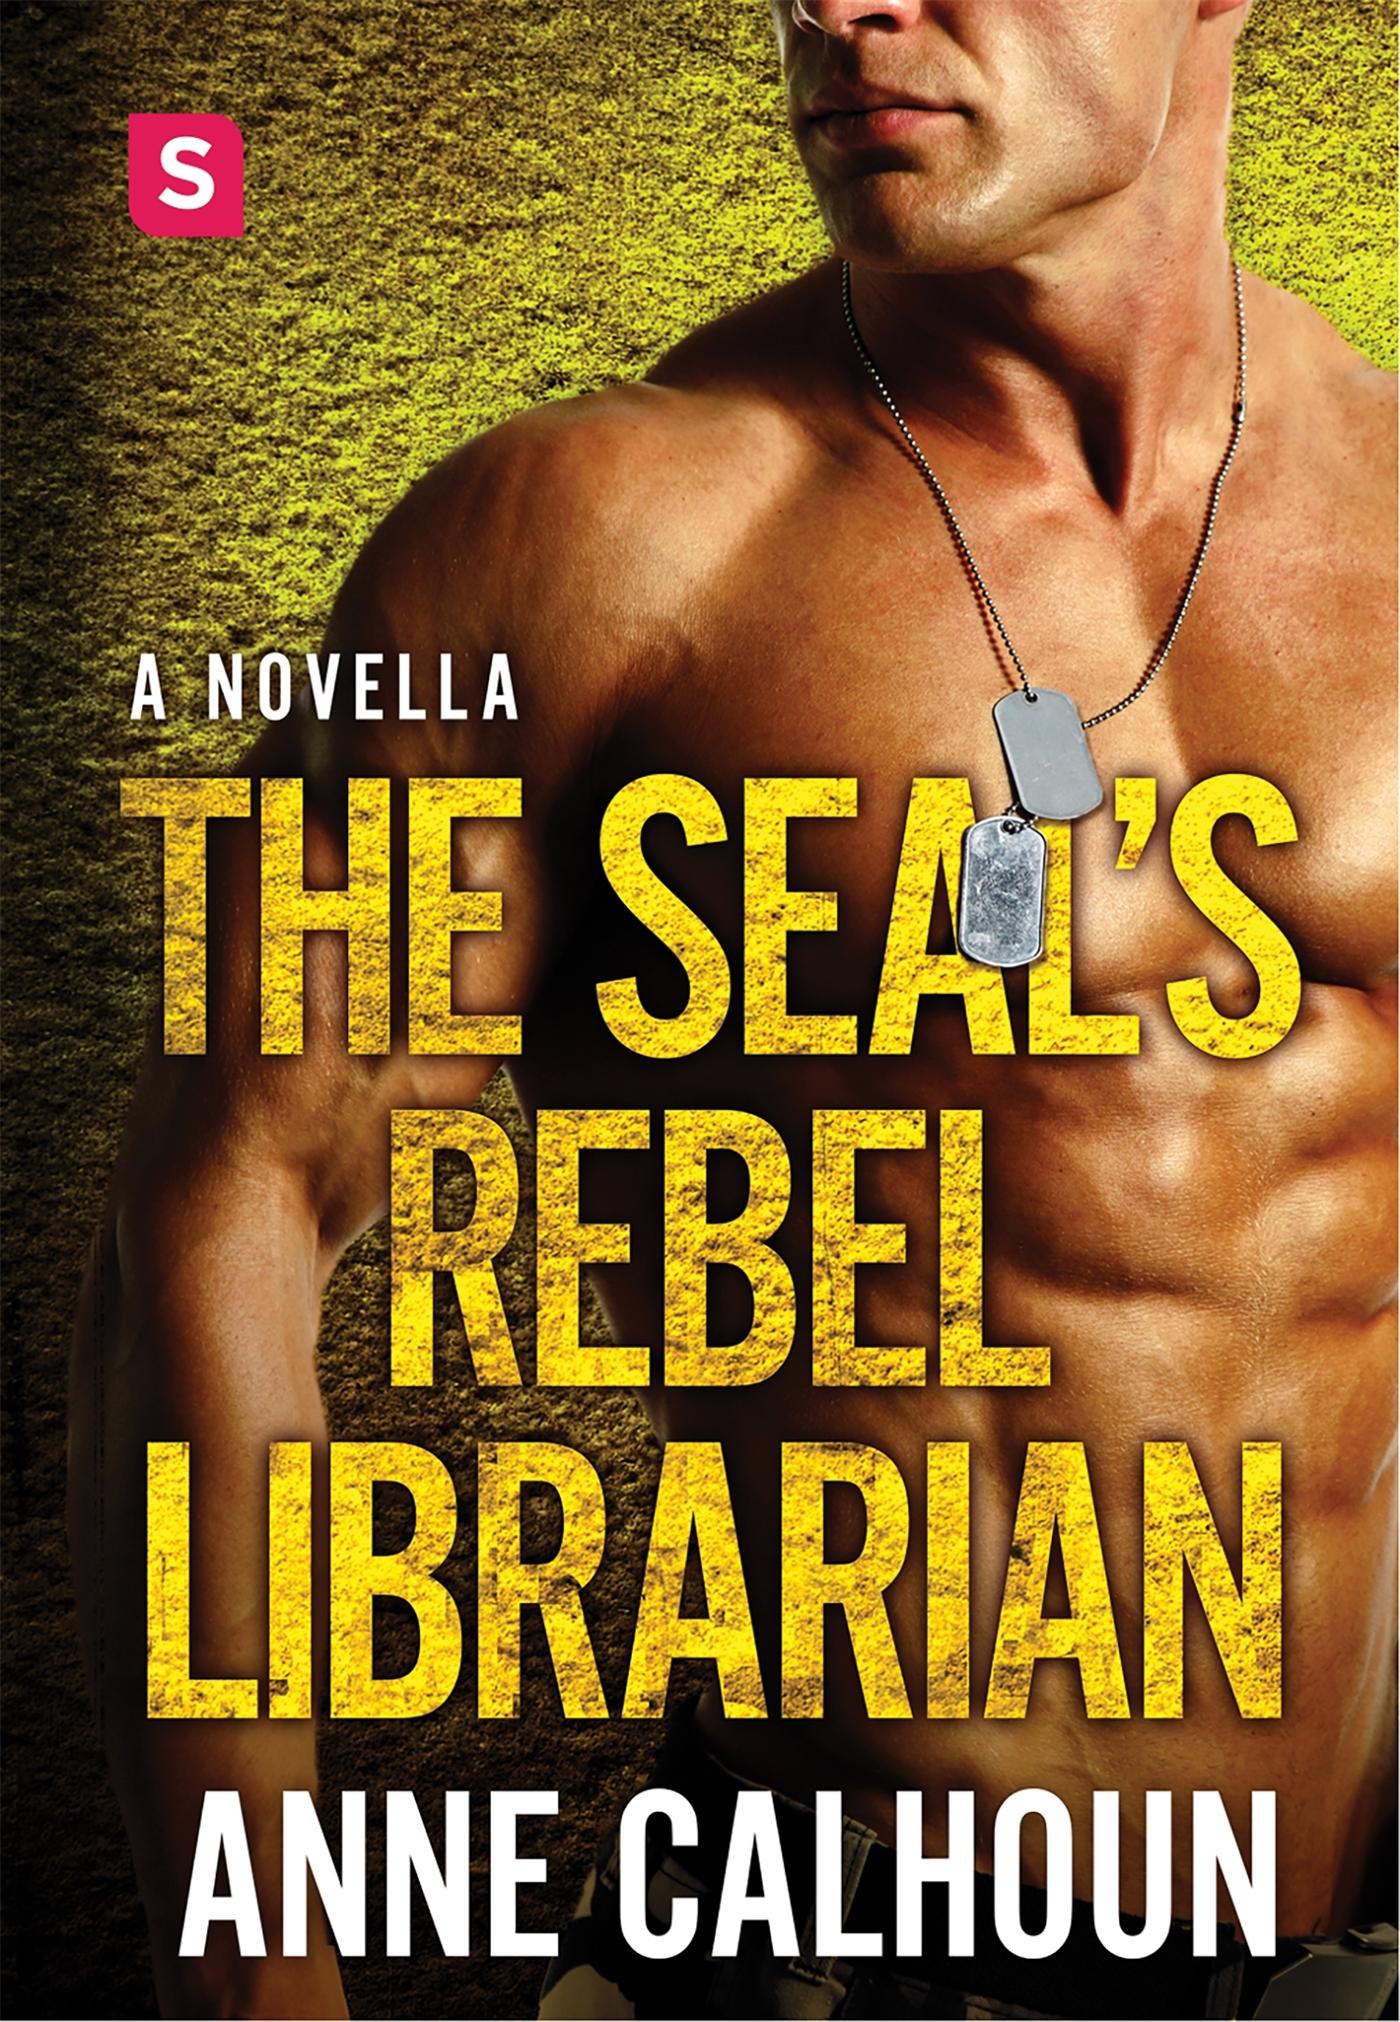 The SEAL's Rebel Librarian by Anne Calhoun